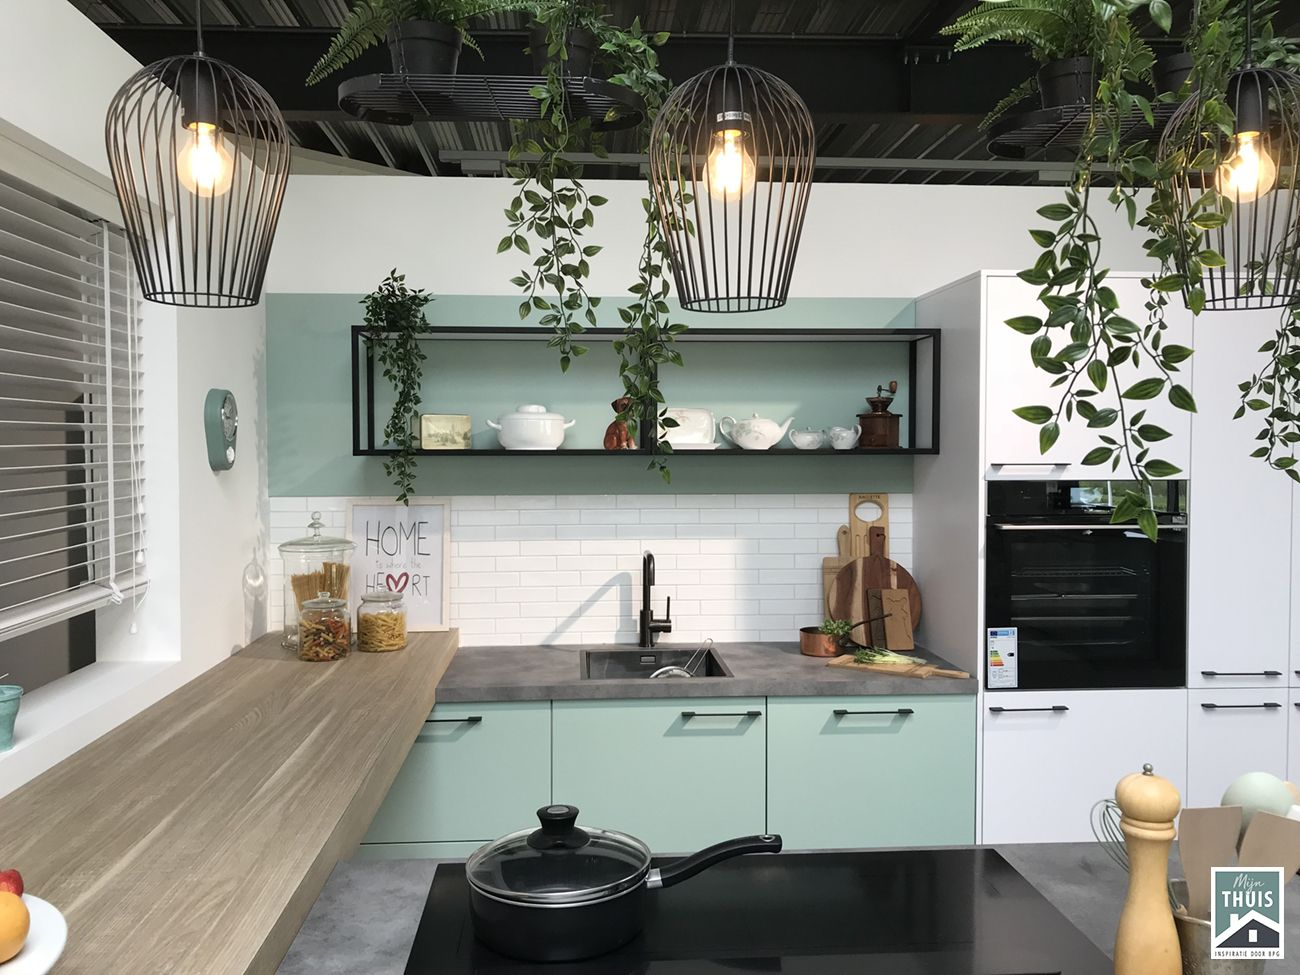 Mint Groene Keuken : Mint groene keuken beton look blad bij mijn thuis de schouwse